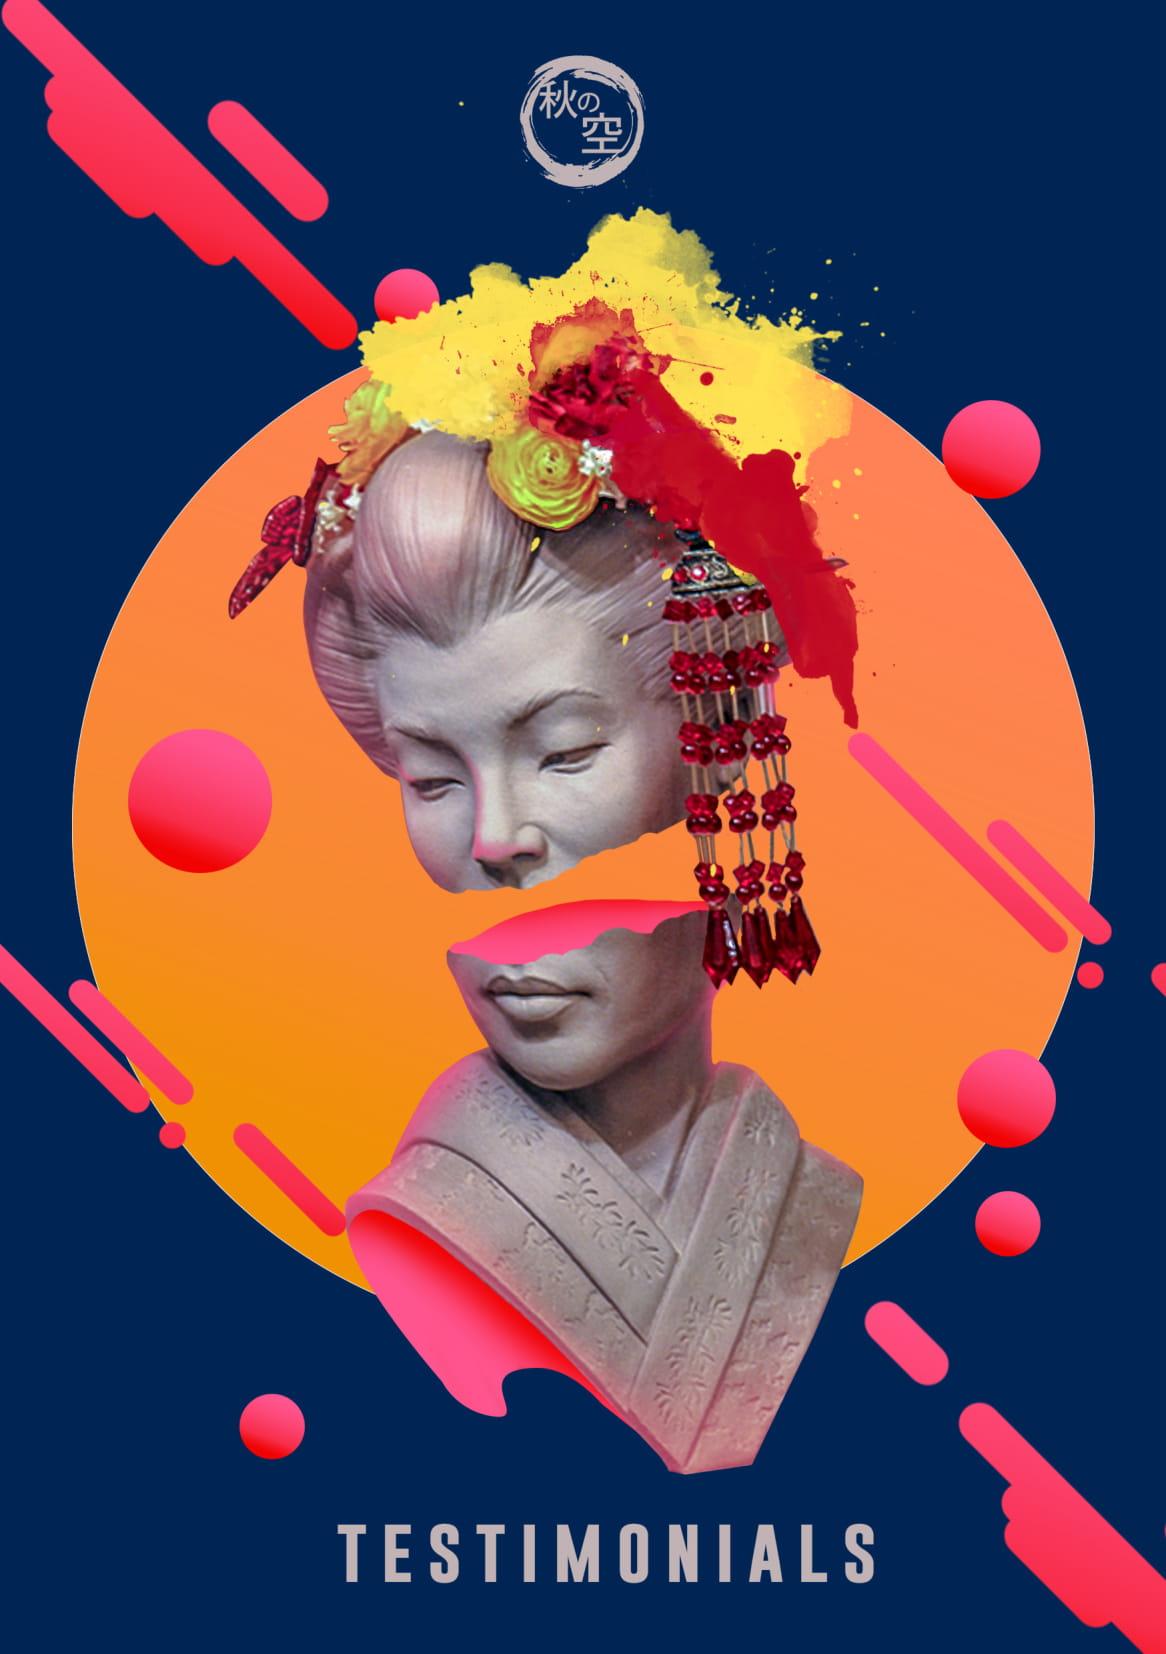 testimoni new design 2018-01